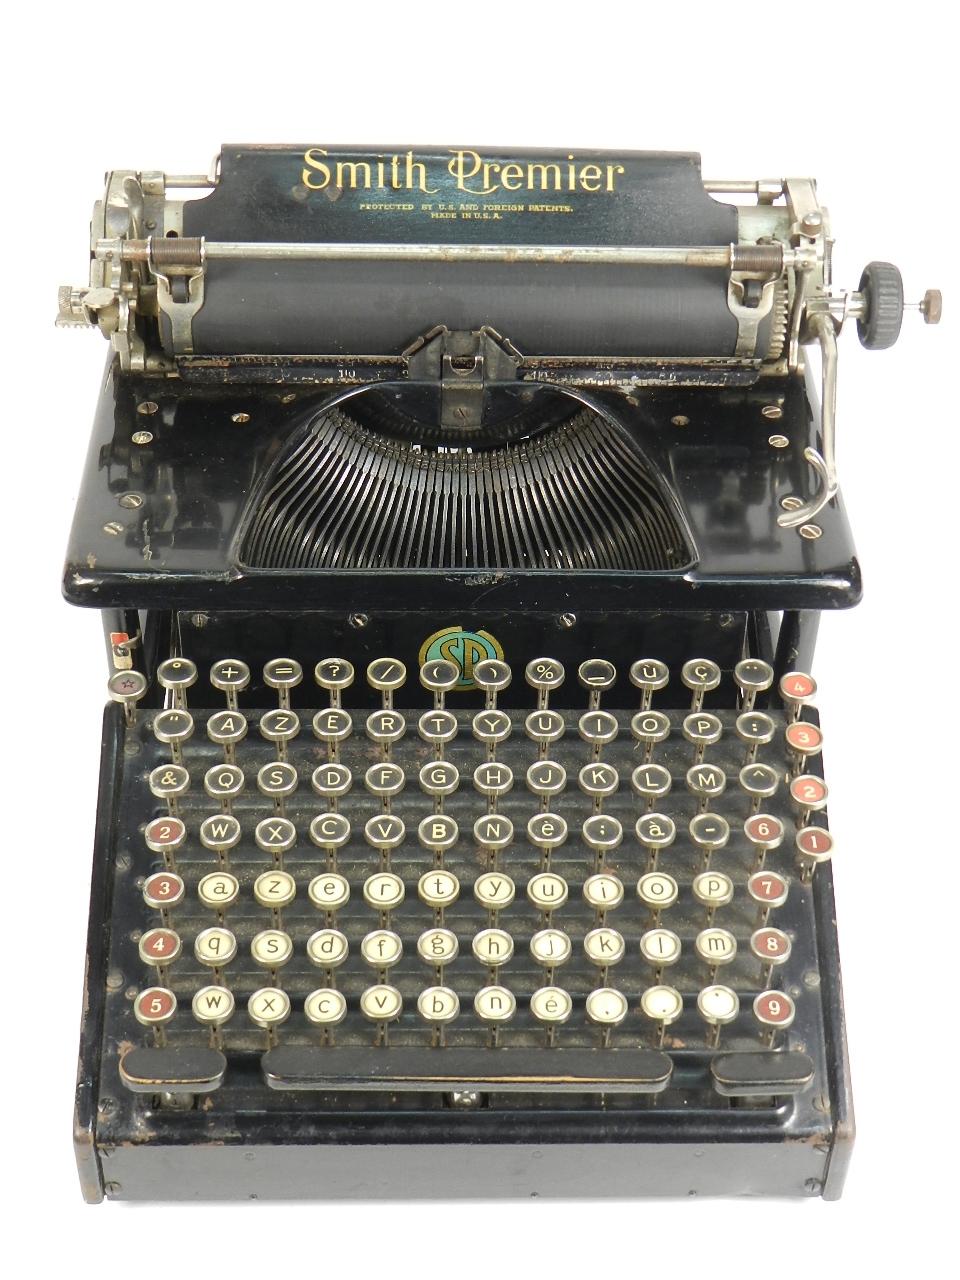 Imagen SMITH PREMIER Nº10  AÑO 1910 27626